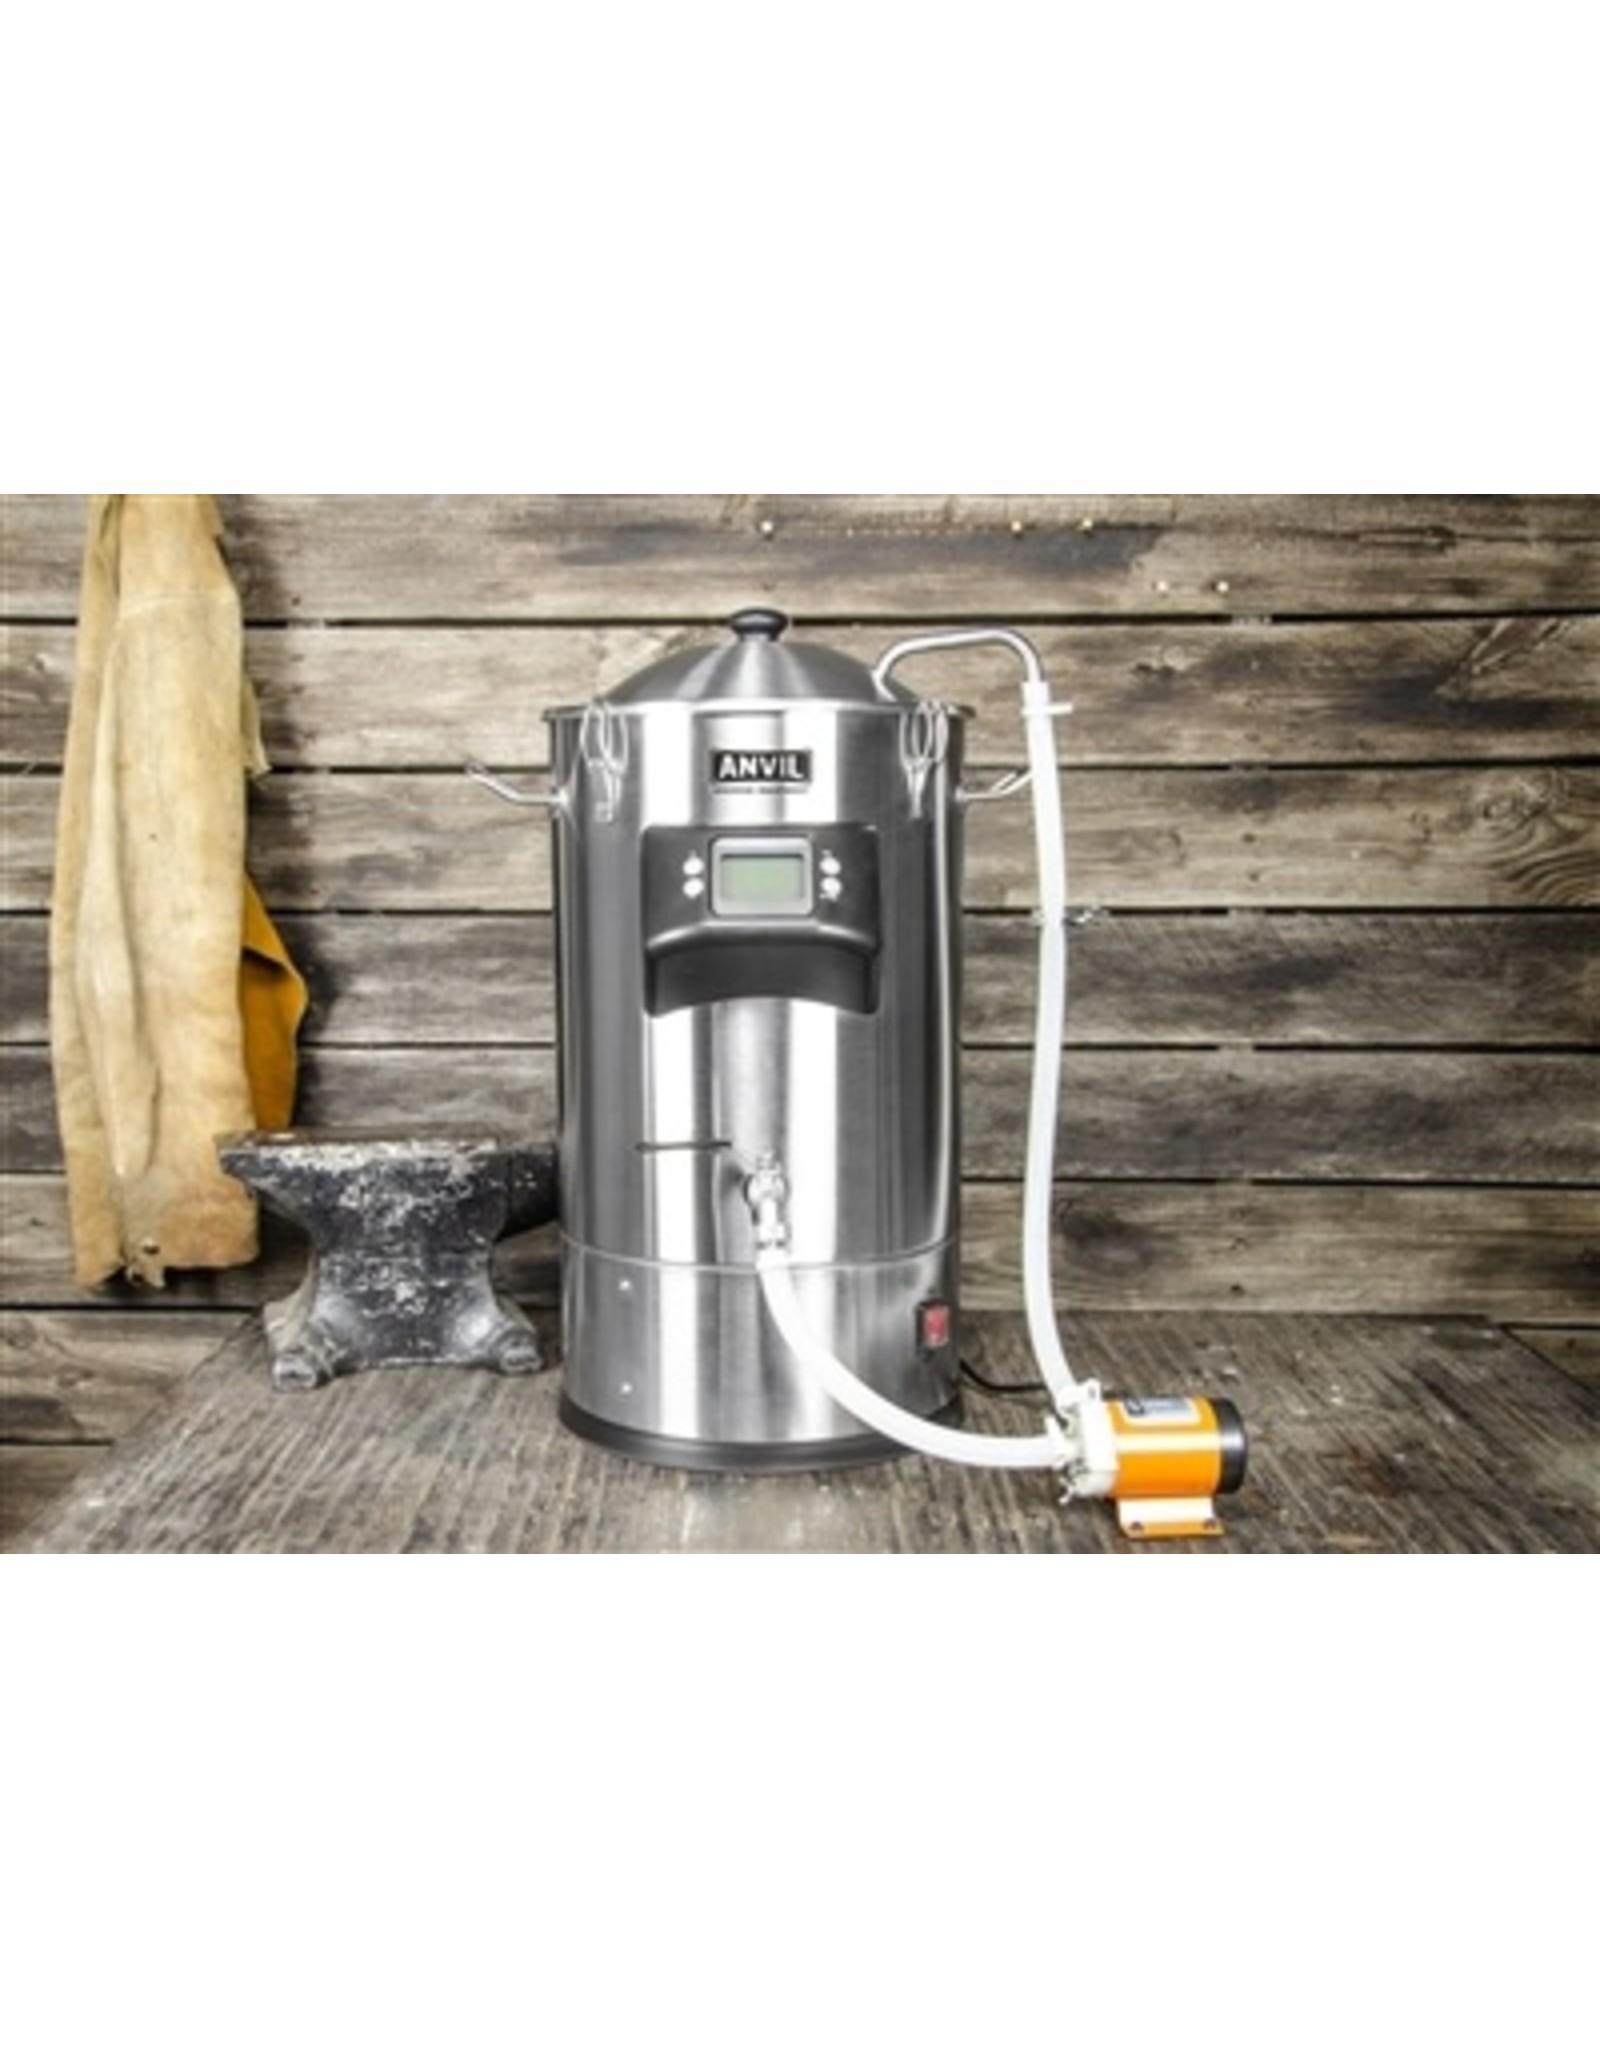 Anvil Anvil Foundry - 6.5 Gallon with Recirculation Pump